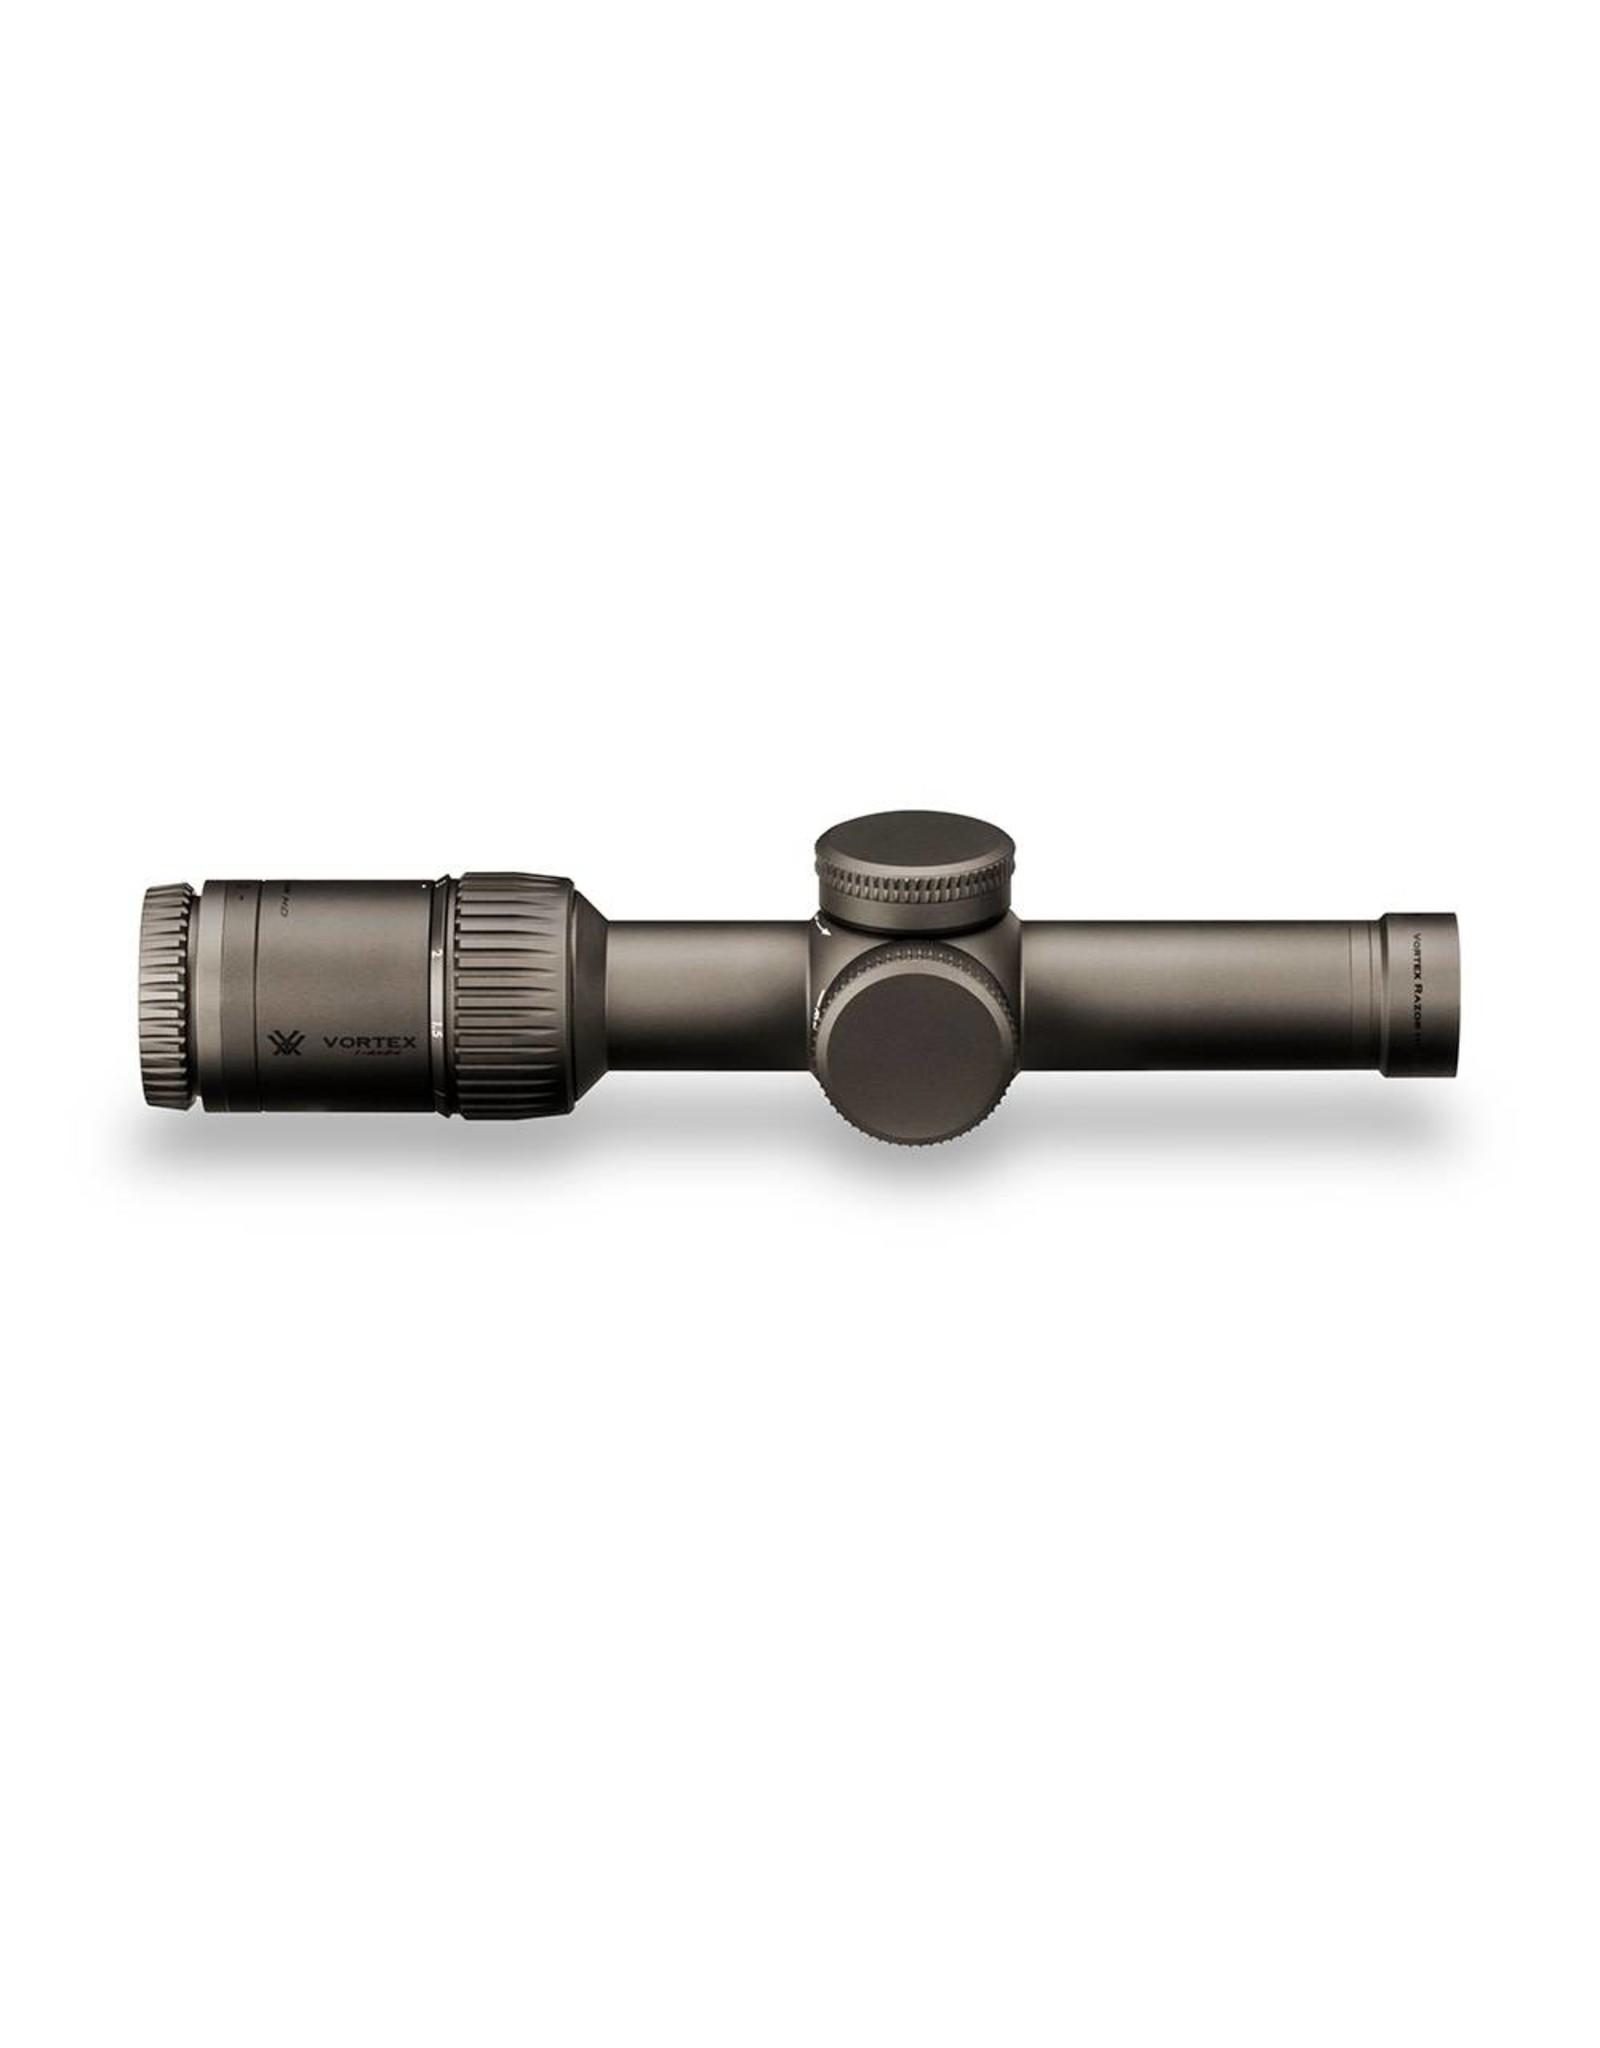 Vortex Vortex Razor Gen II HD-E 1-6x24 Riflescope VMR-2 mrad